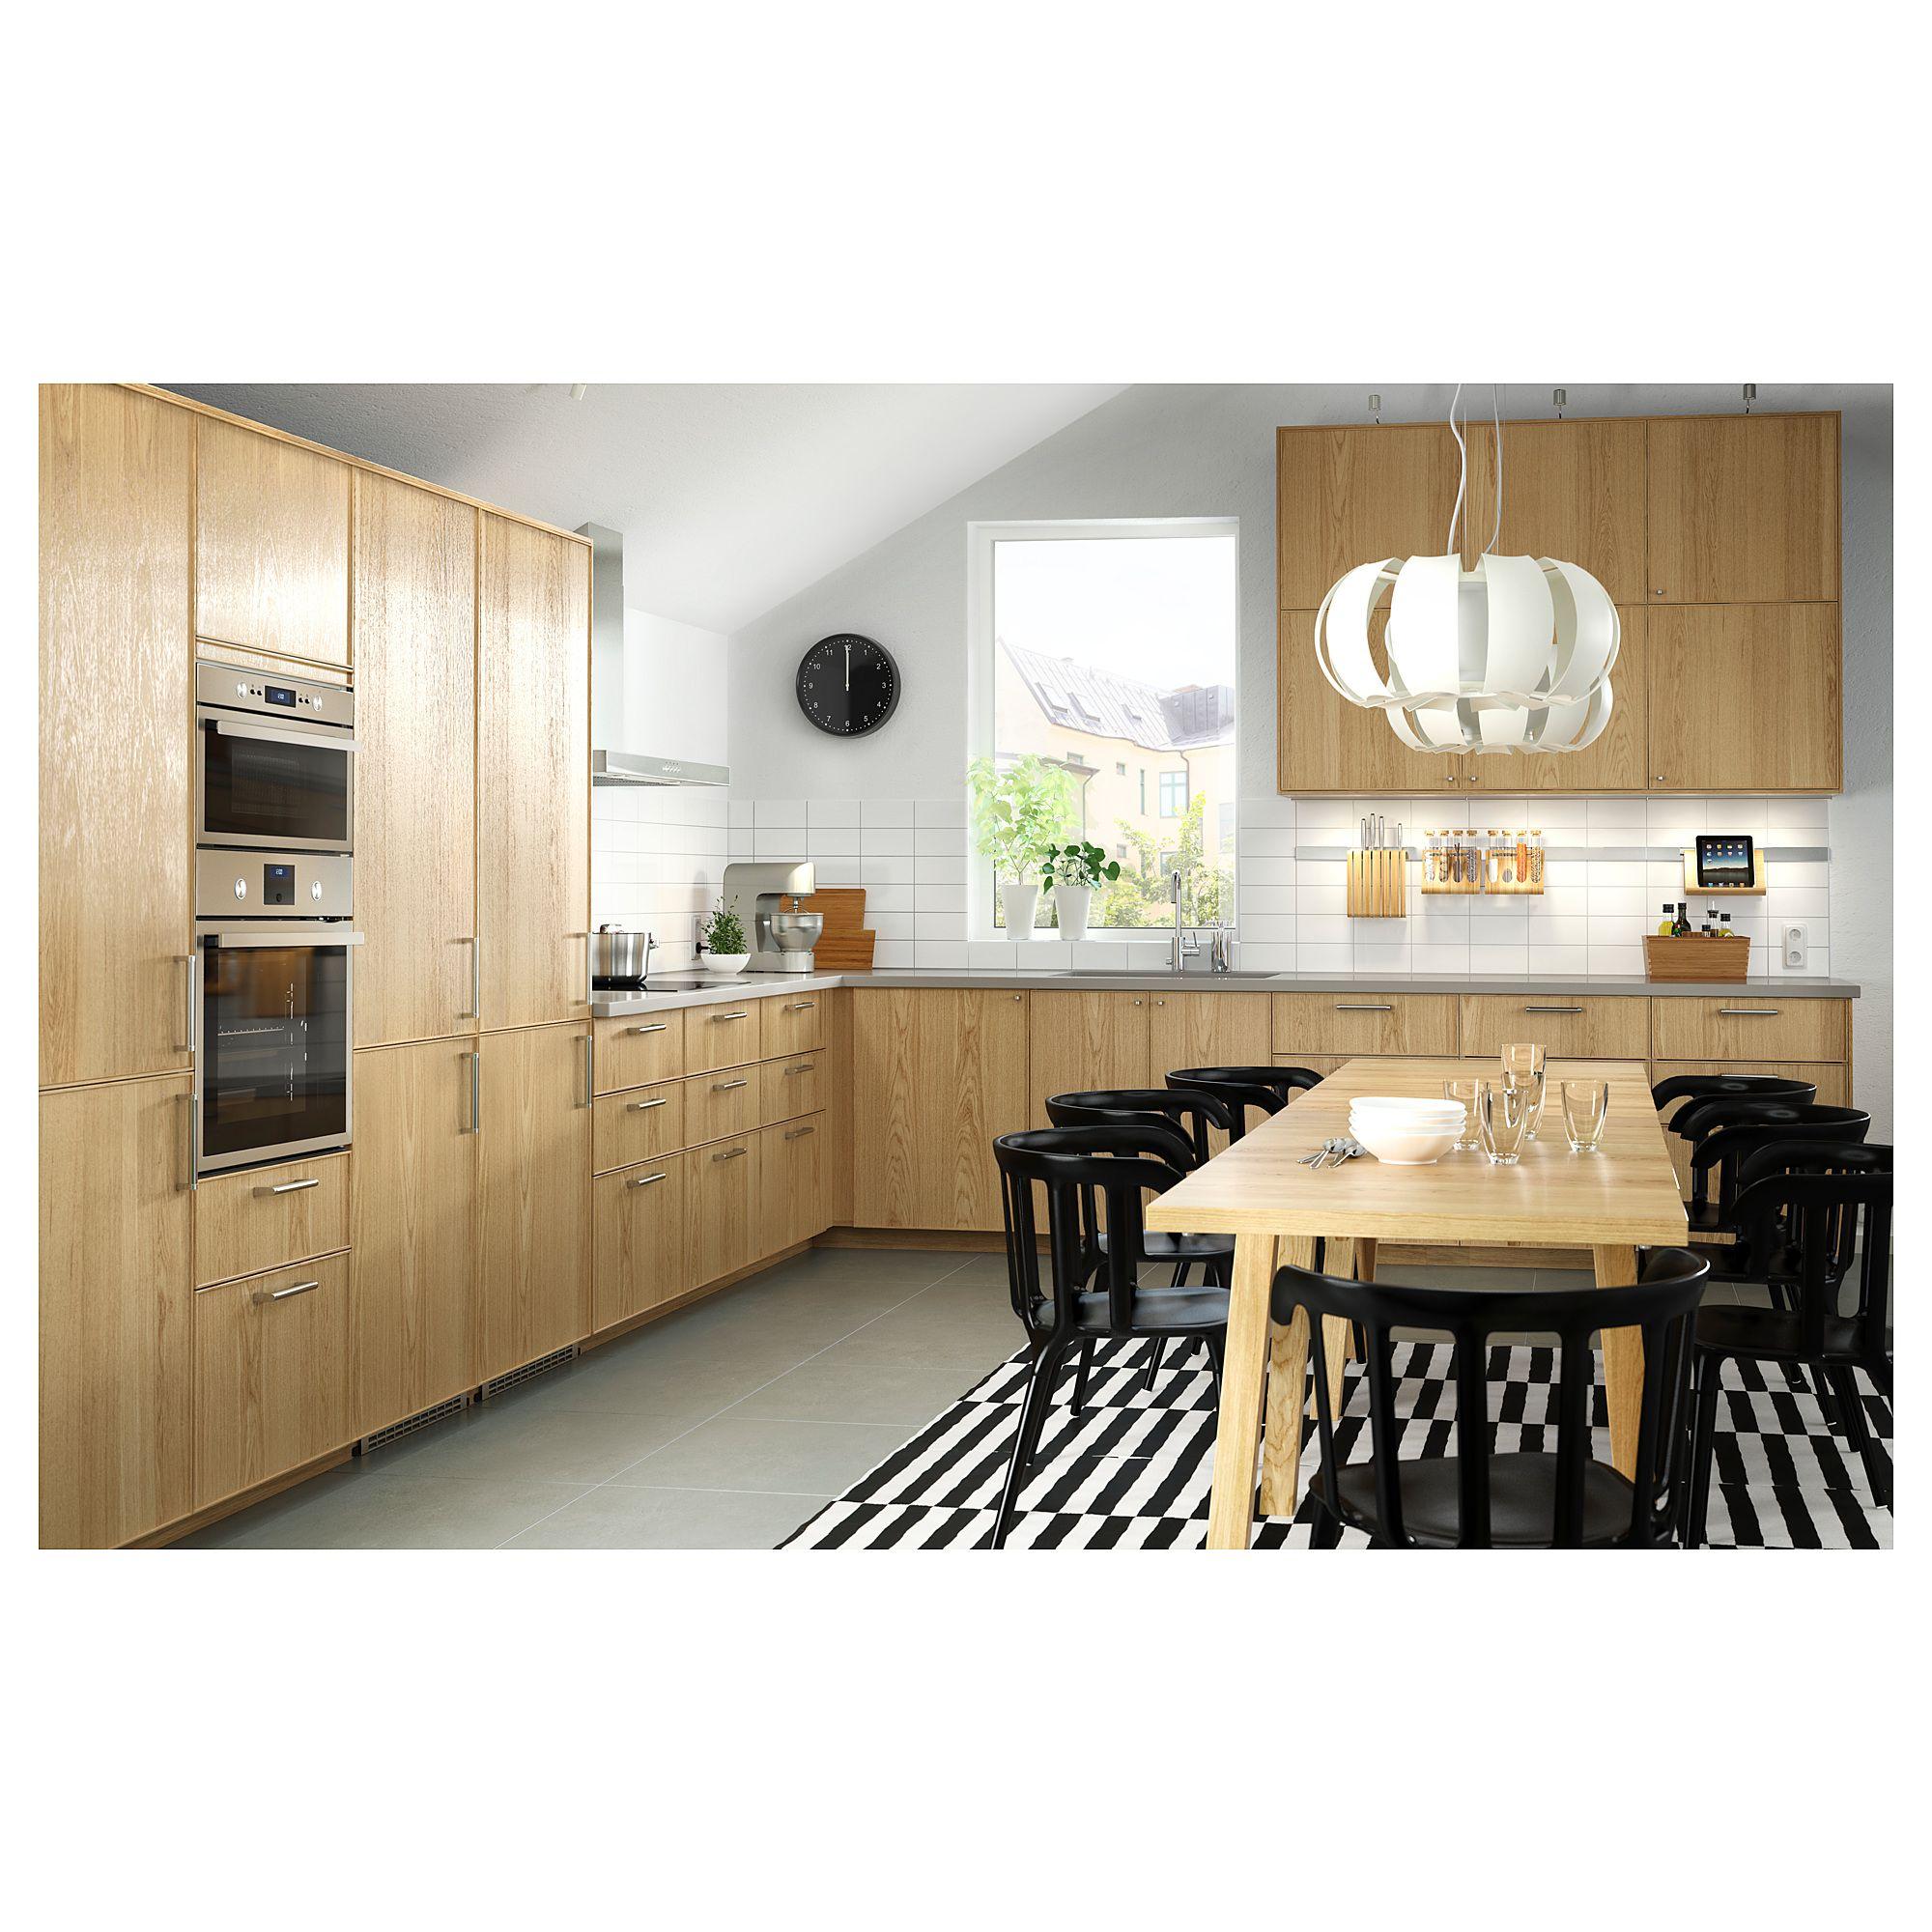 IKEA - STOCKHOLM Rug, flatwoven black handmade striped, off-white